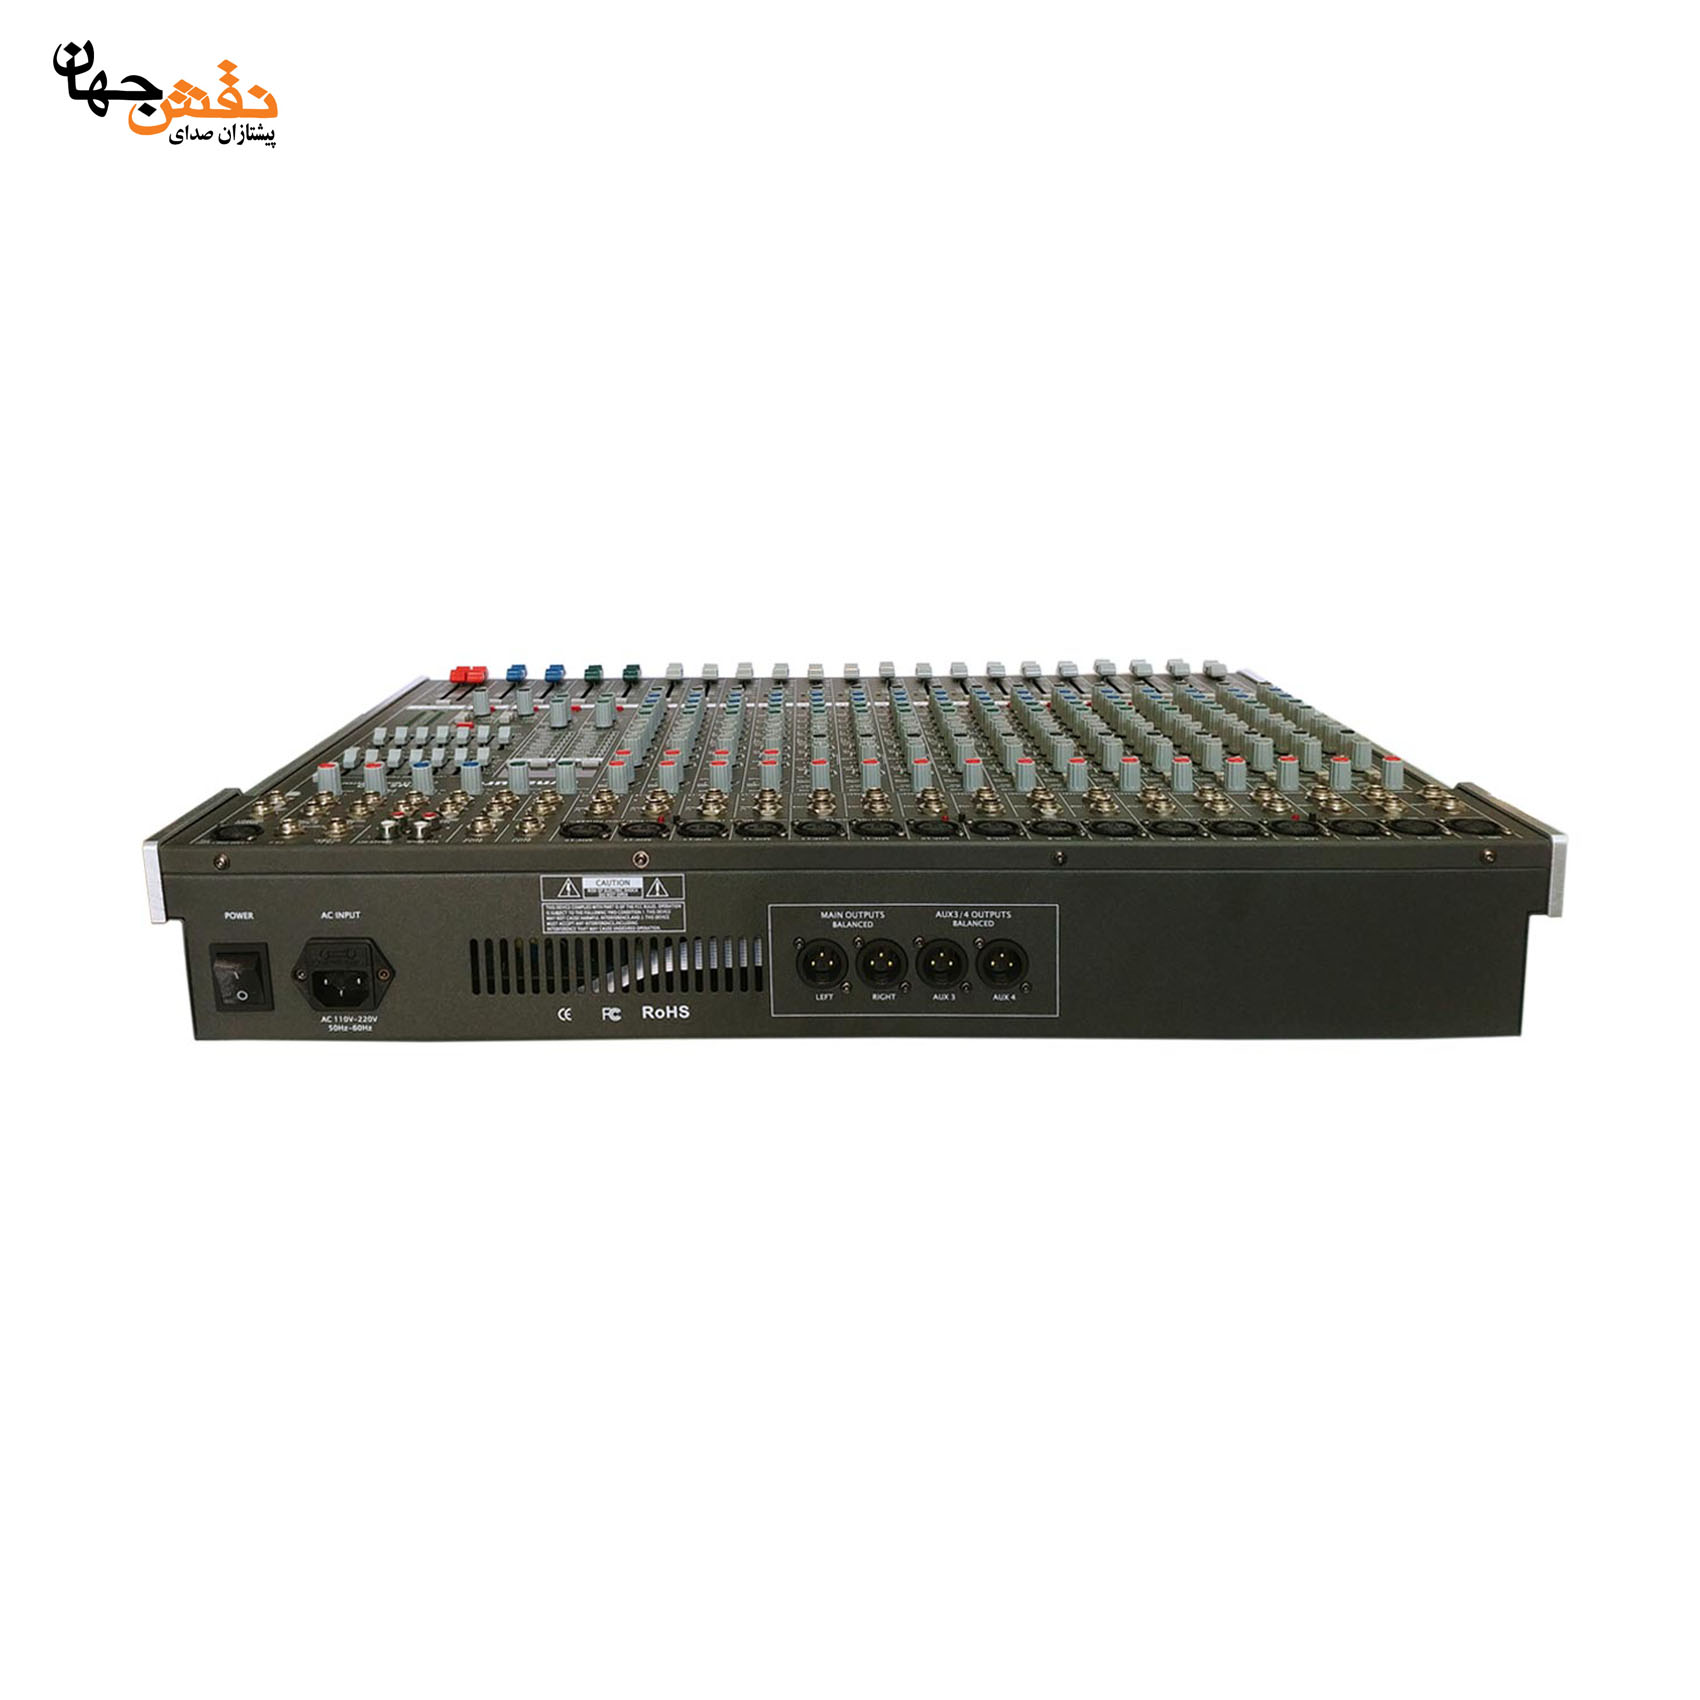 CMS-1600-1